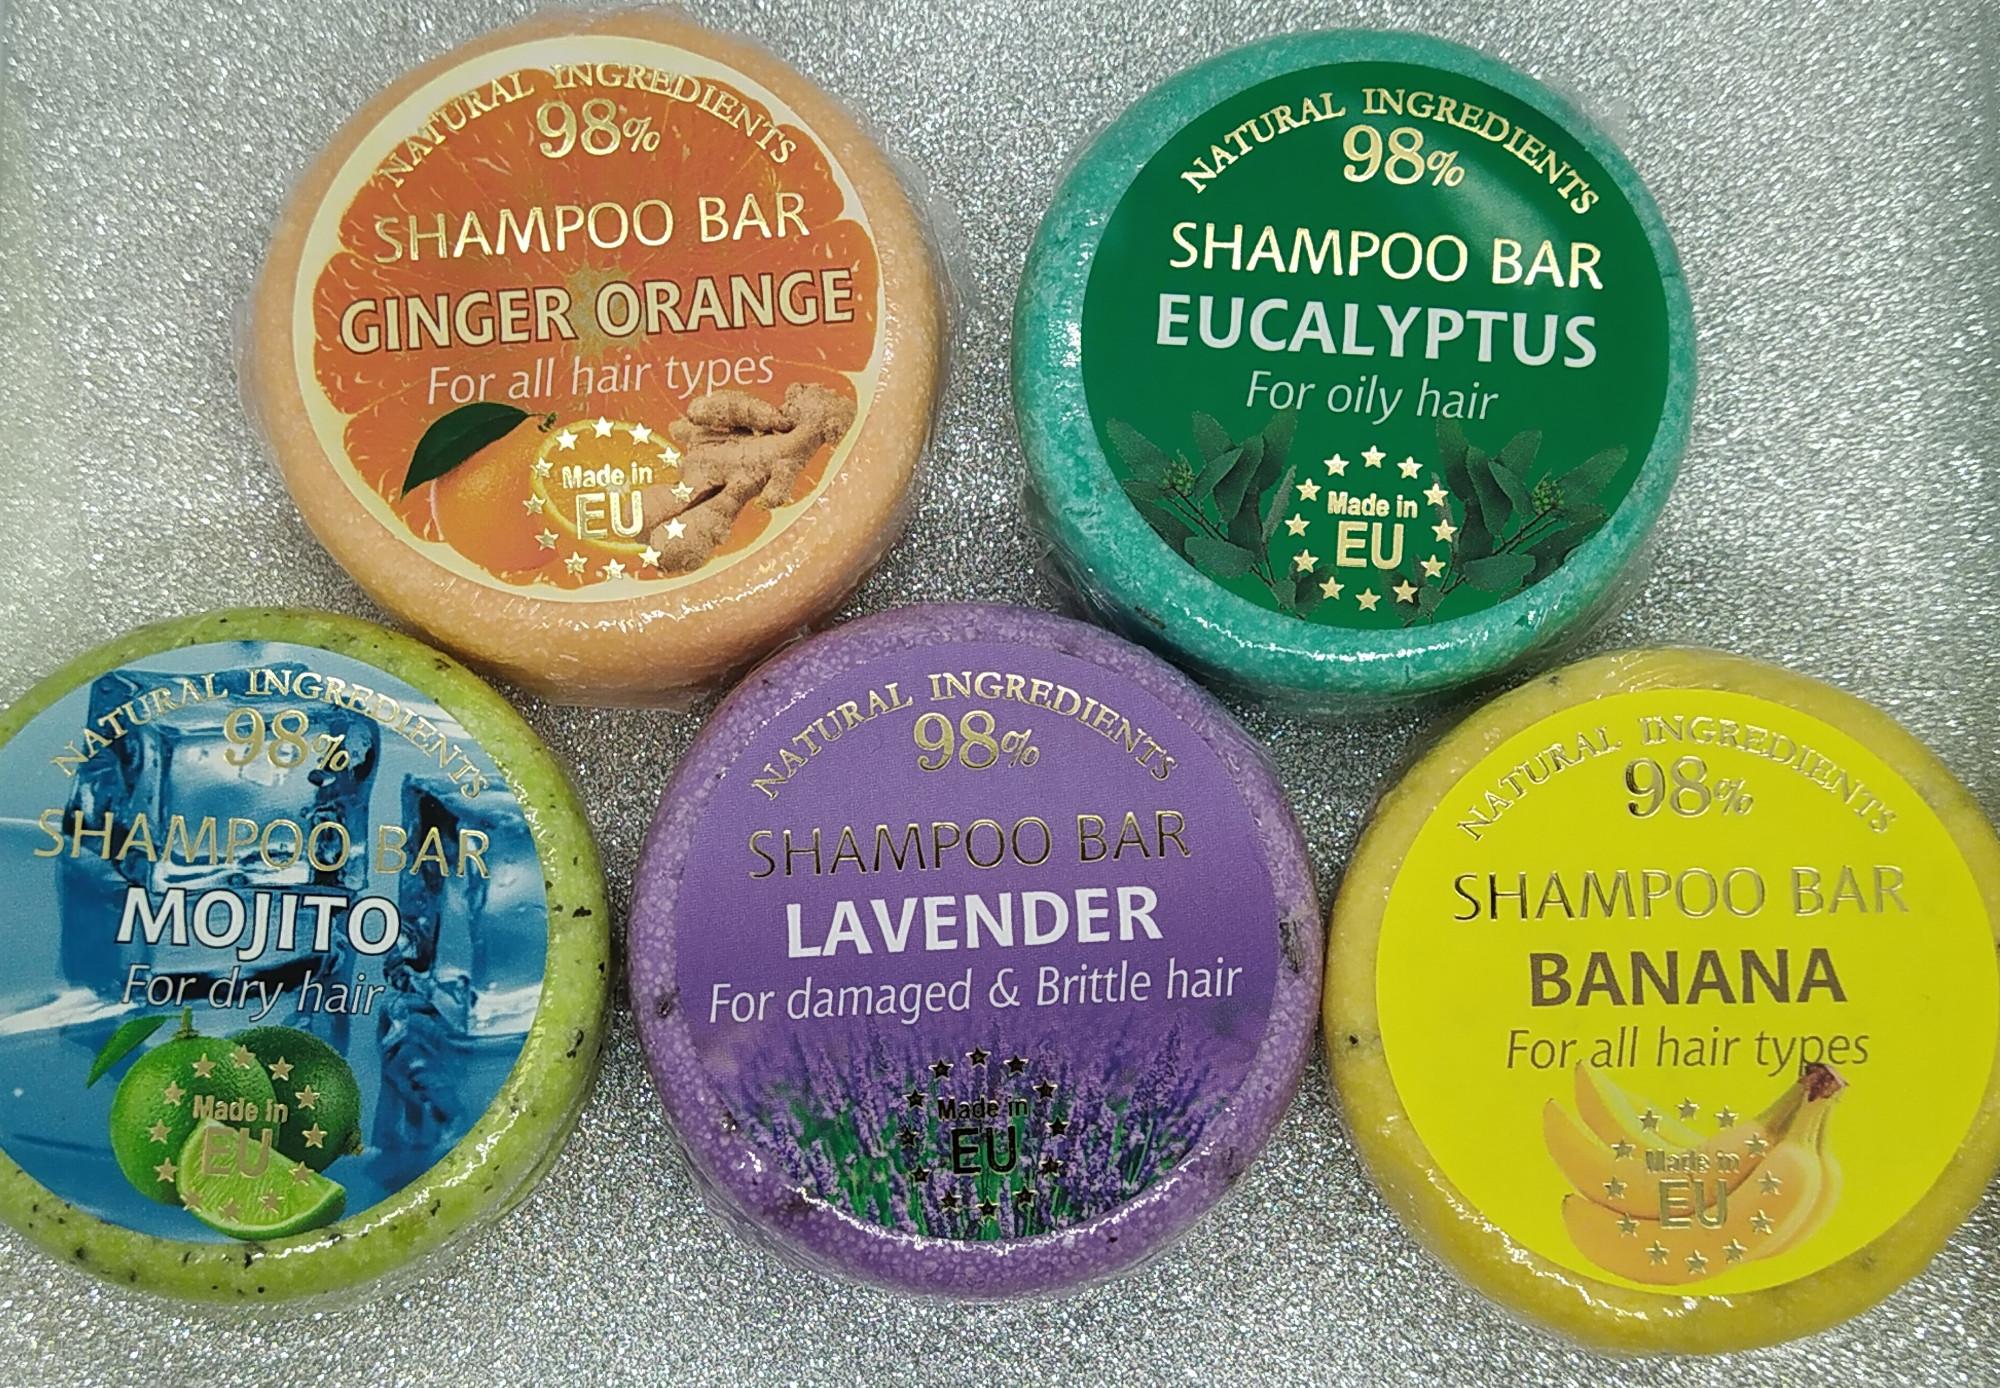 Shampoo Bar Image